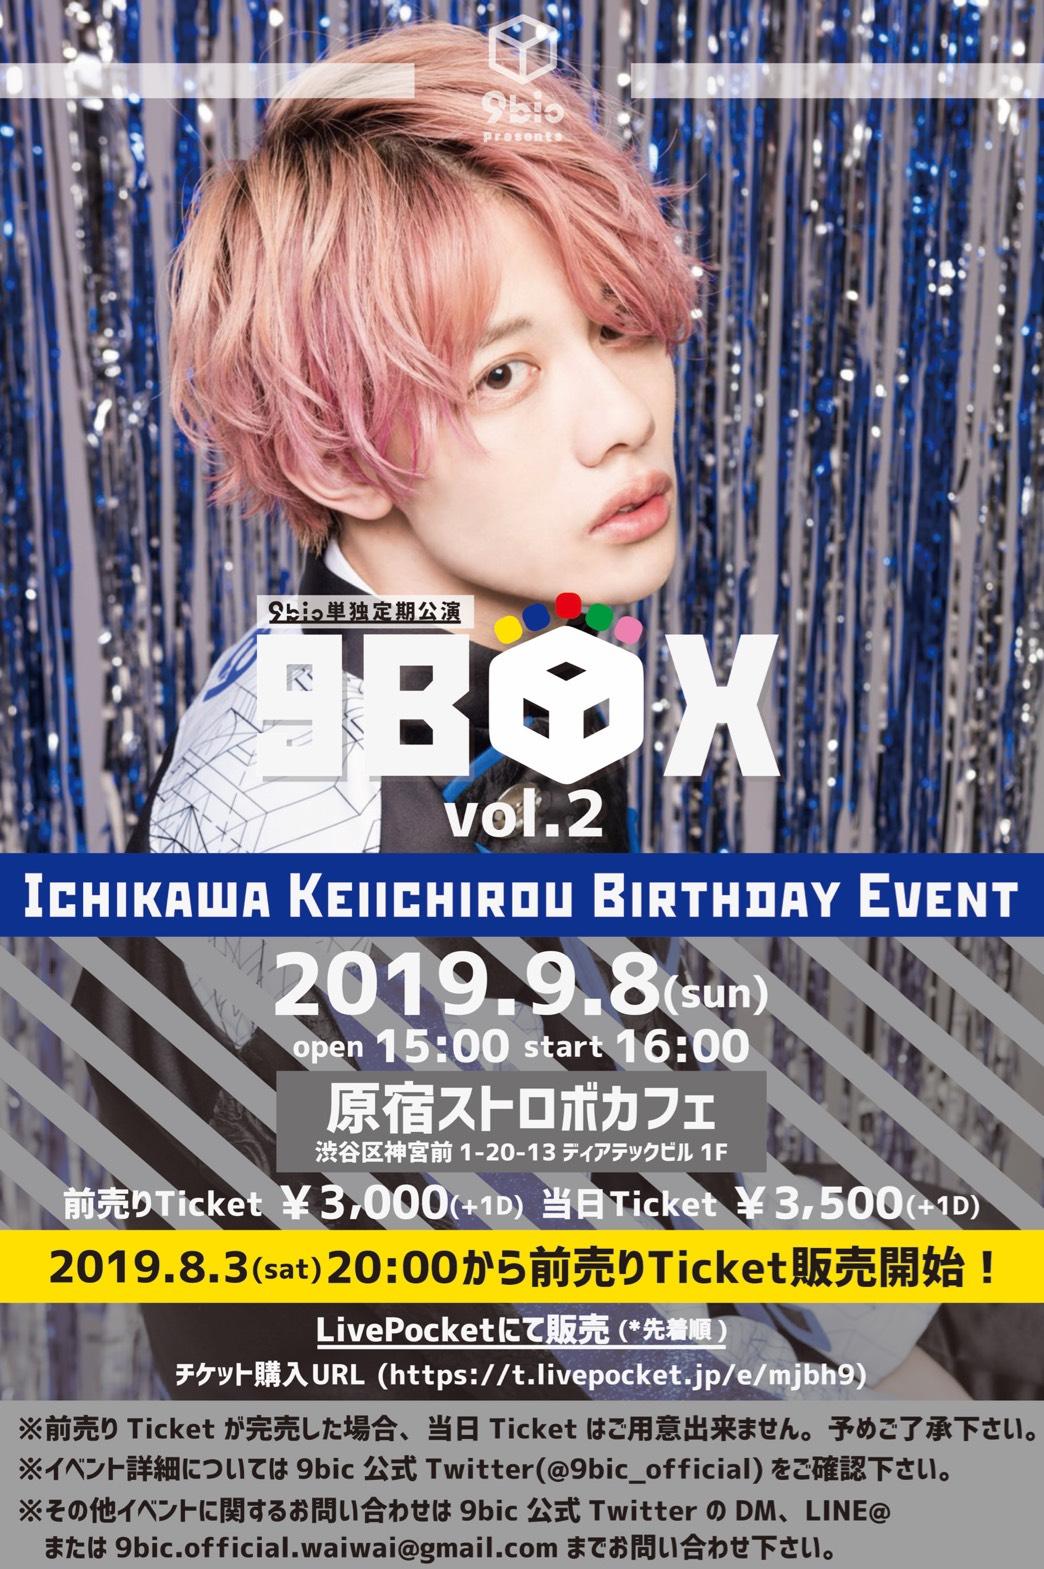 9box vol.2 ~Icikawa Keiichirou Birthday Event~